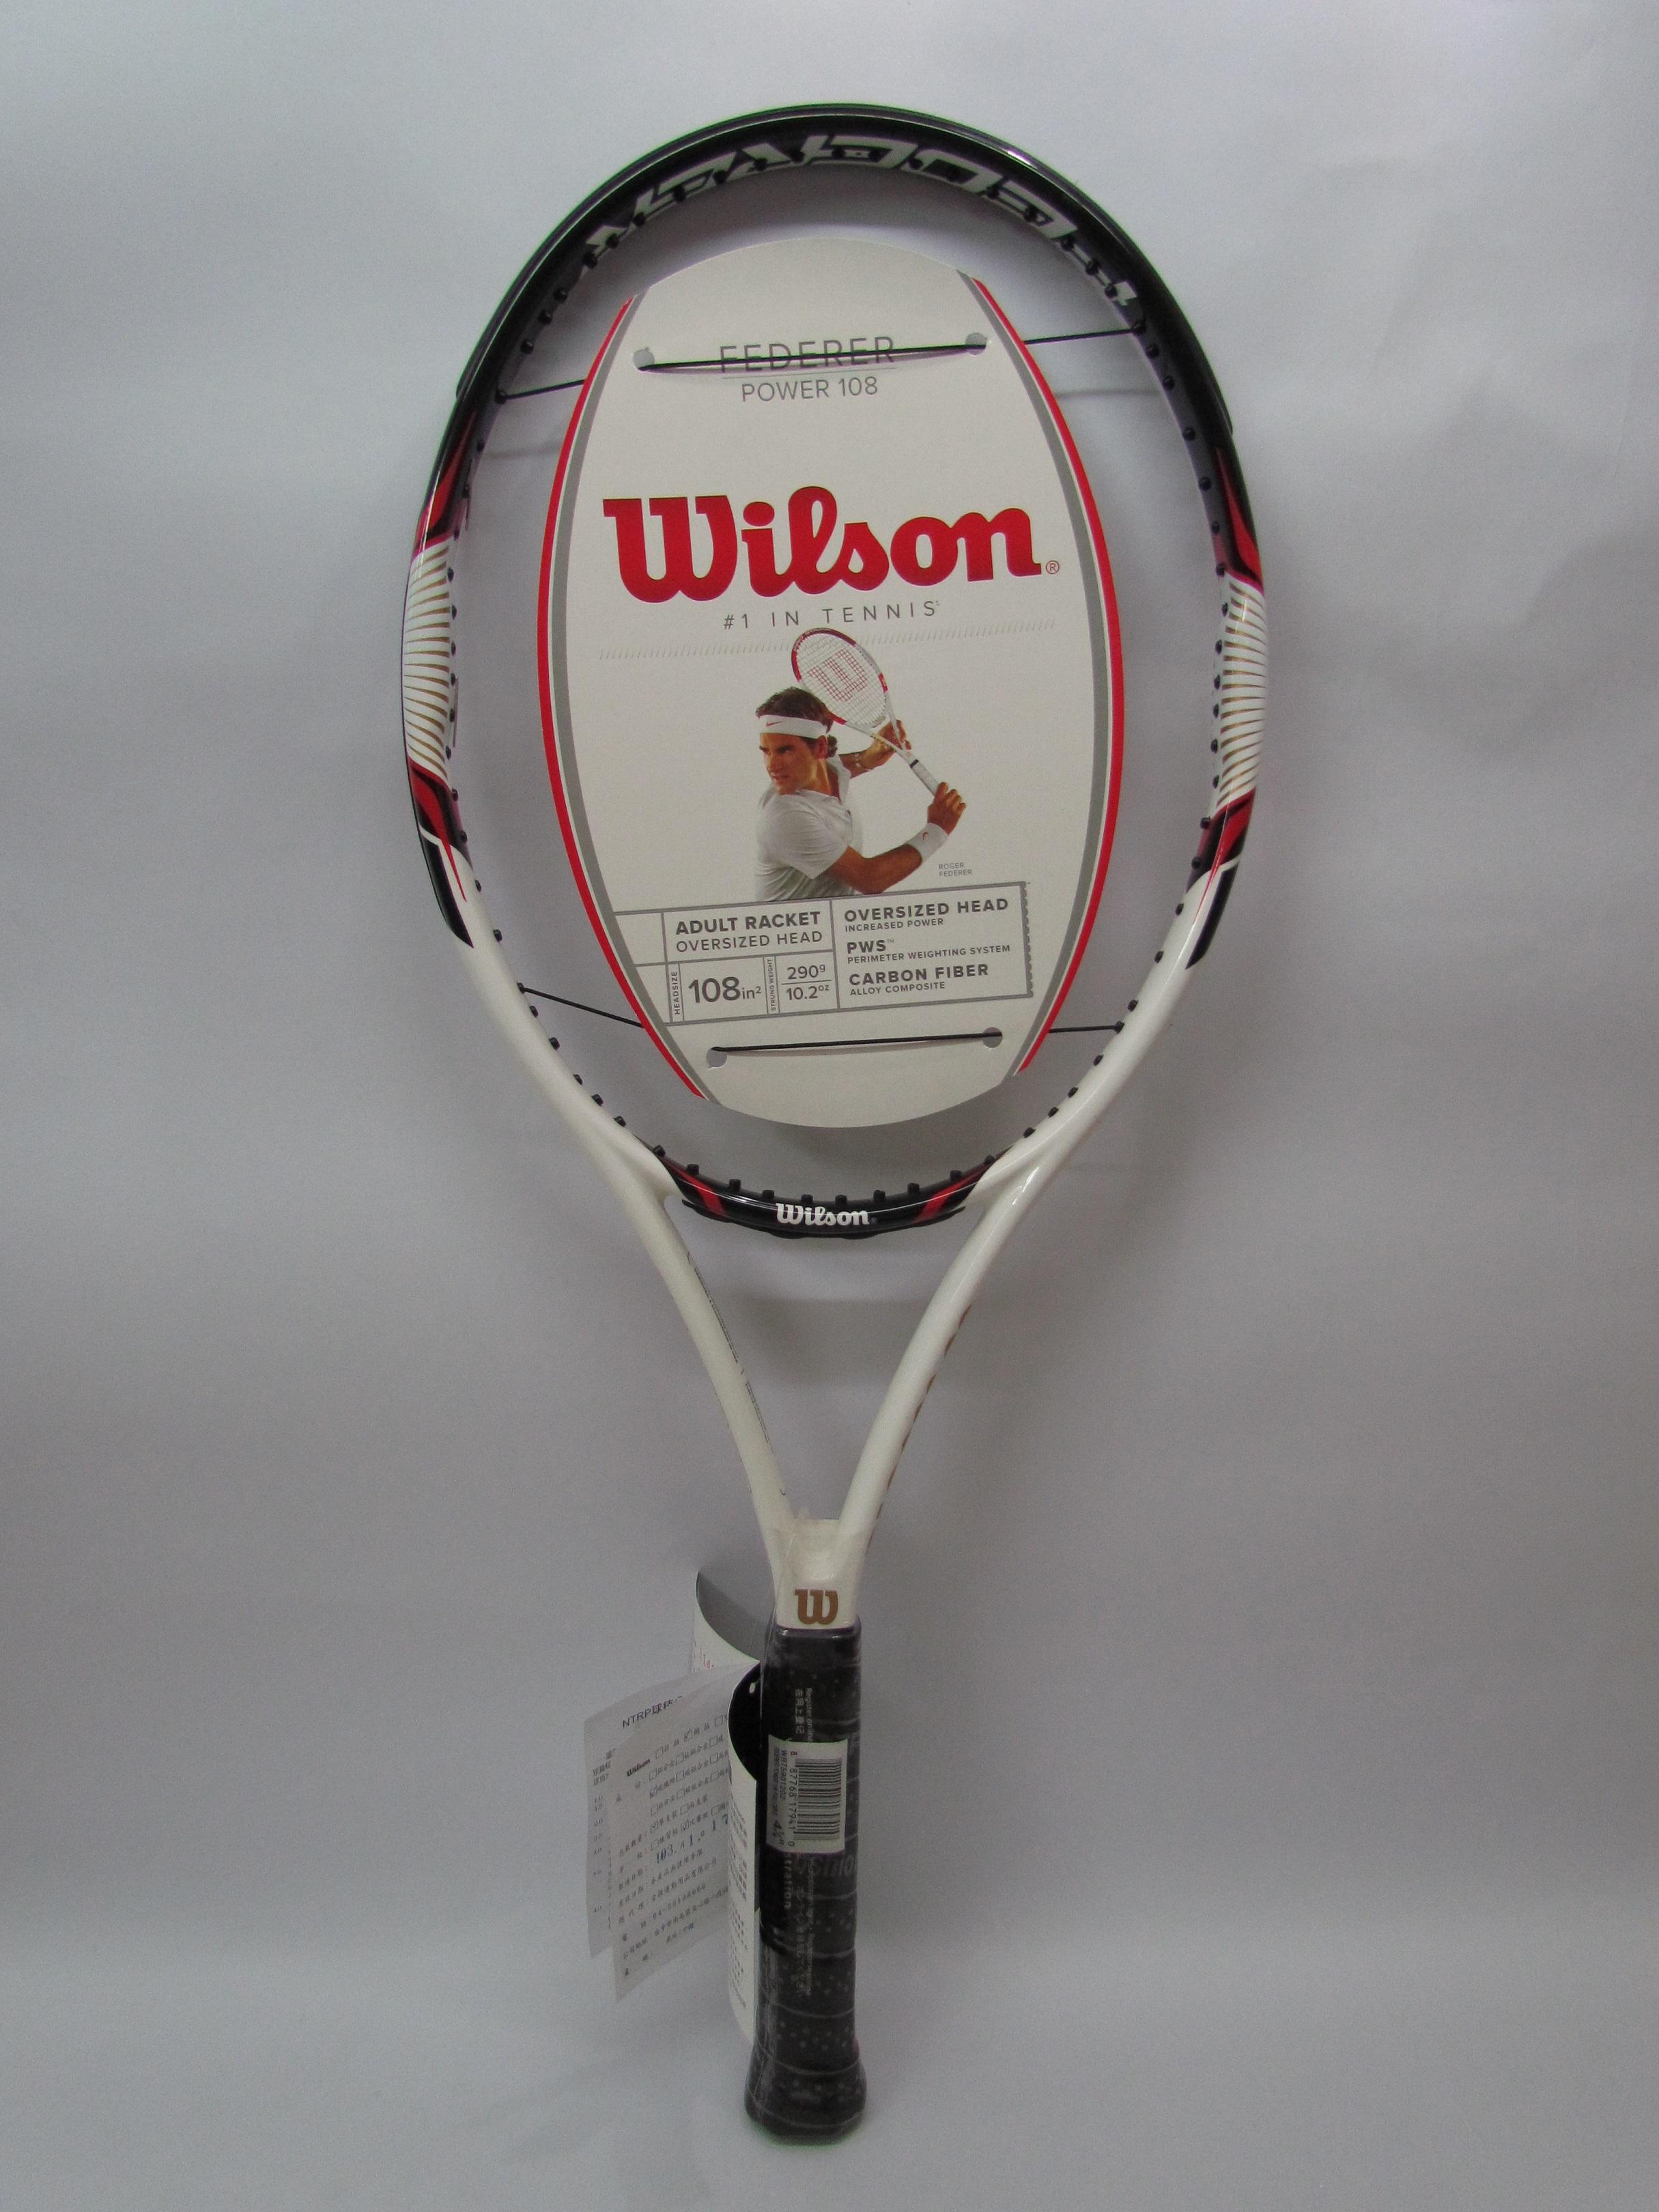 Wilson專業網球拍 Federer Power 108